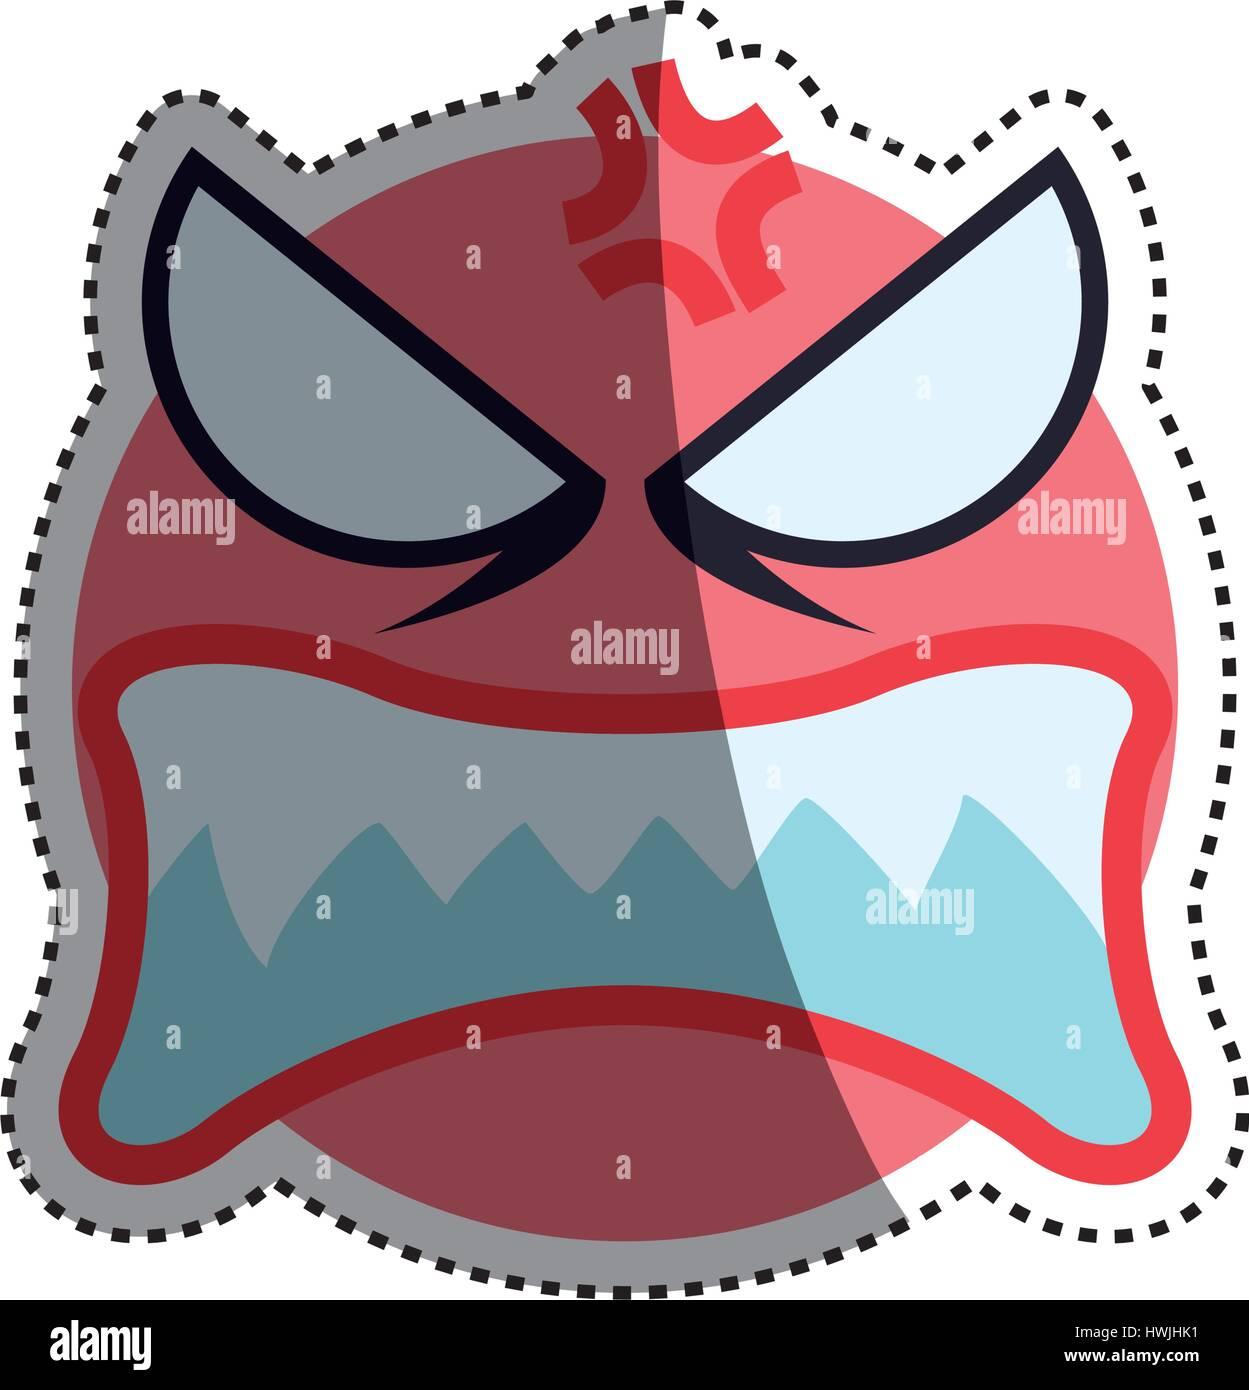 Angry cartoon face - Stock Vector